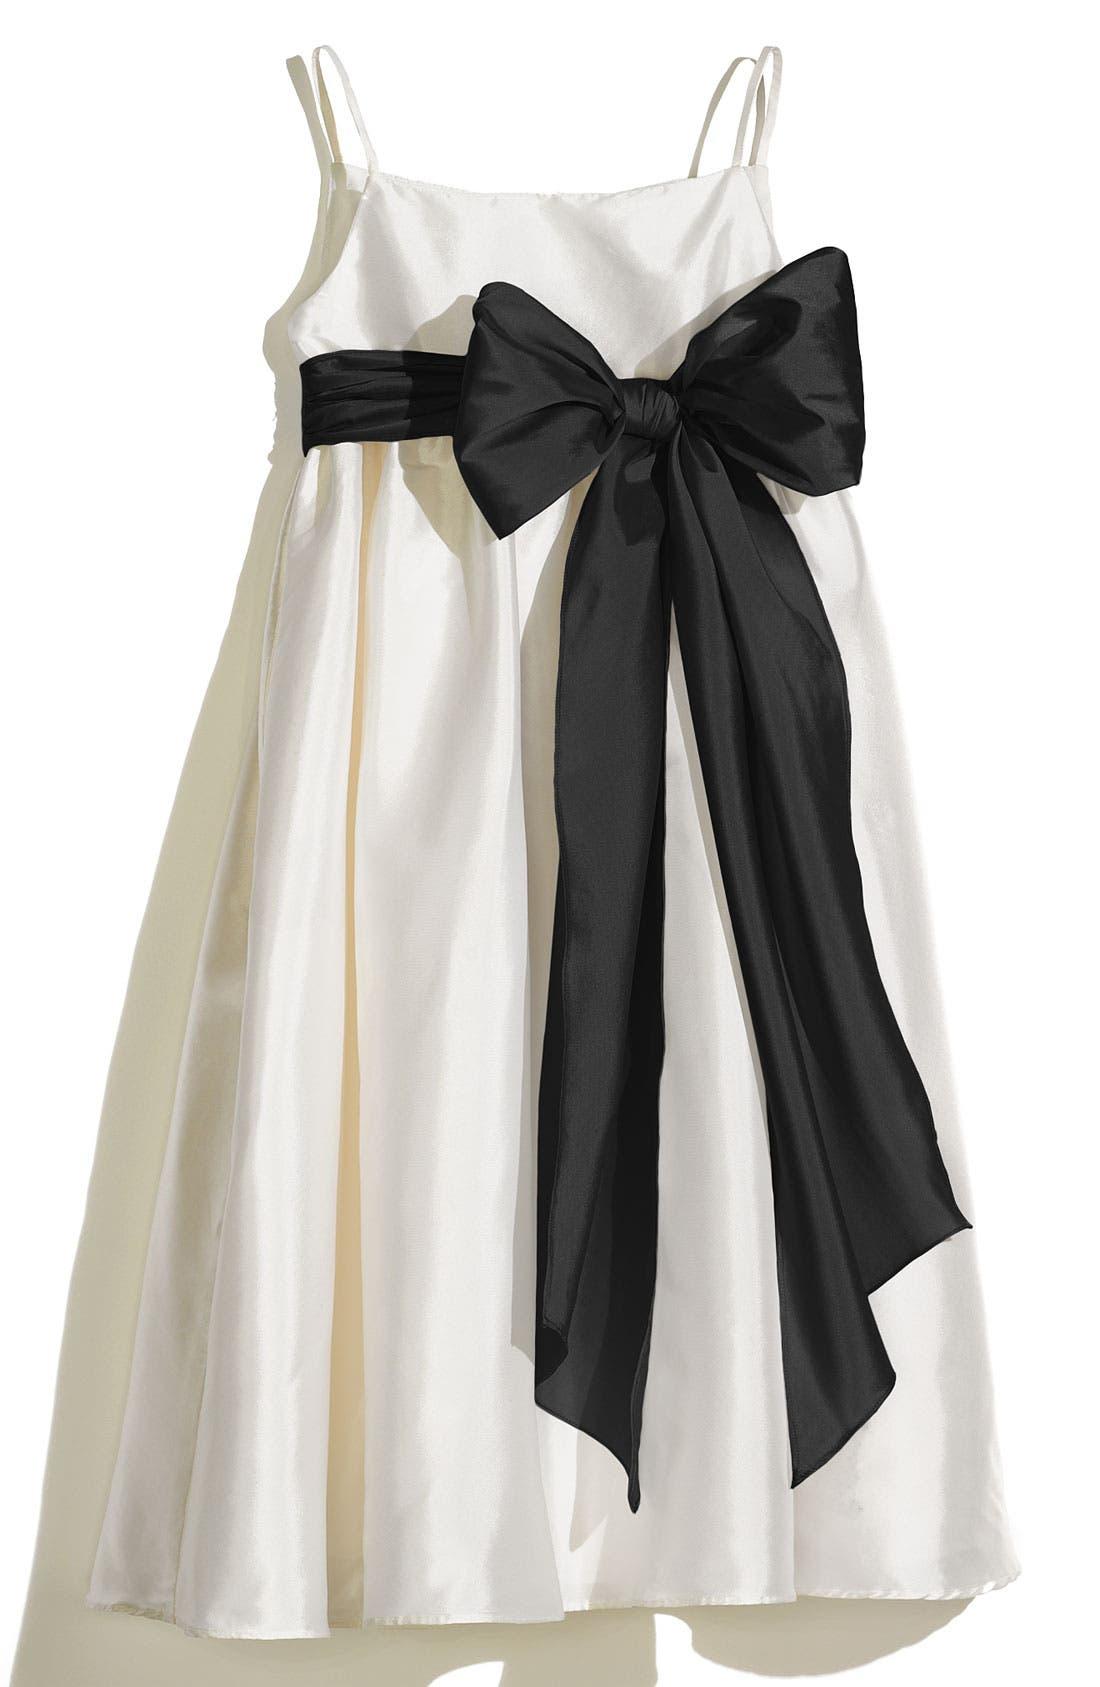 A-Line Dress with Sash,                             Main thumbnail 1, color,                             Ivory/ Black